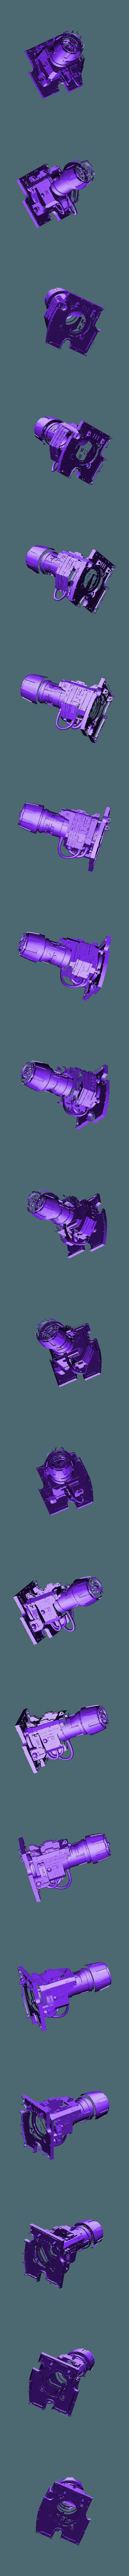 RAPID_GUN_BACK.stl Download free STL file IMPERIAL RAPID CANNON - ULTRA MEGA PACK ! • 3D printer template, yaemhay